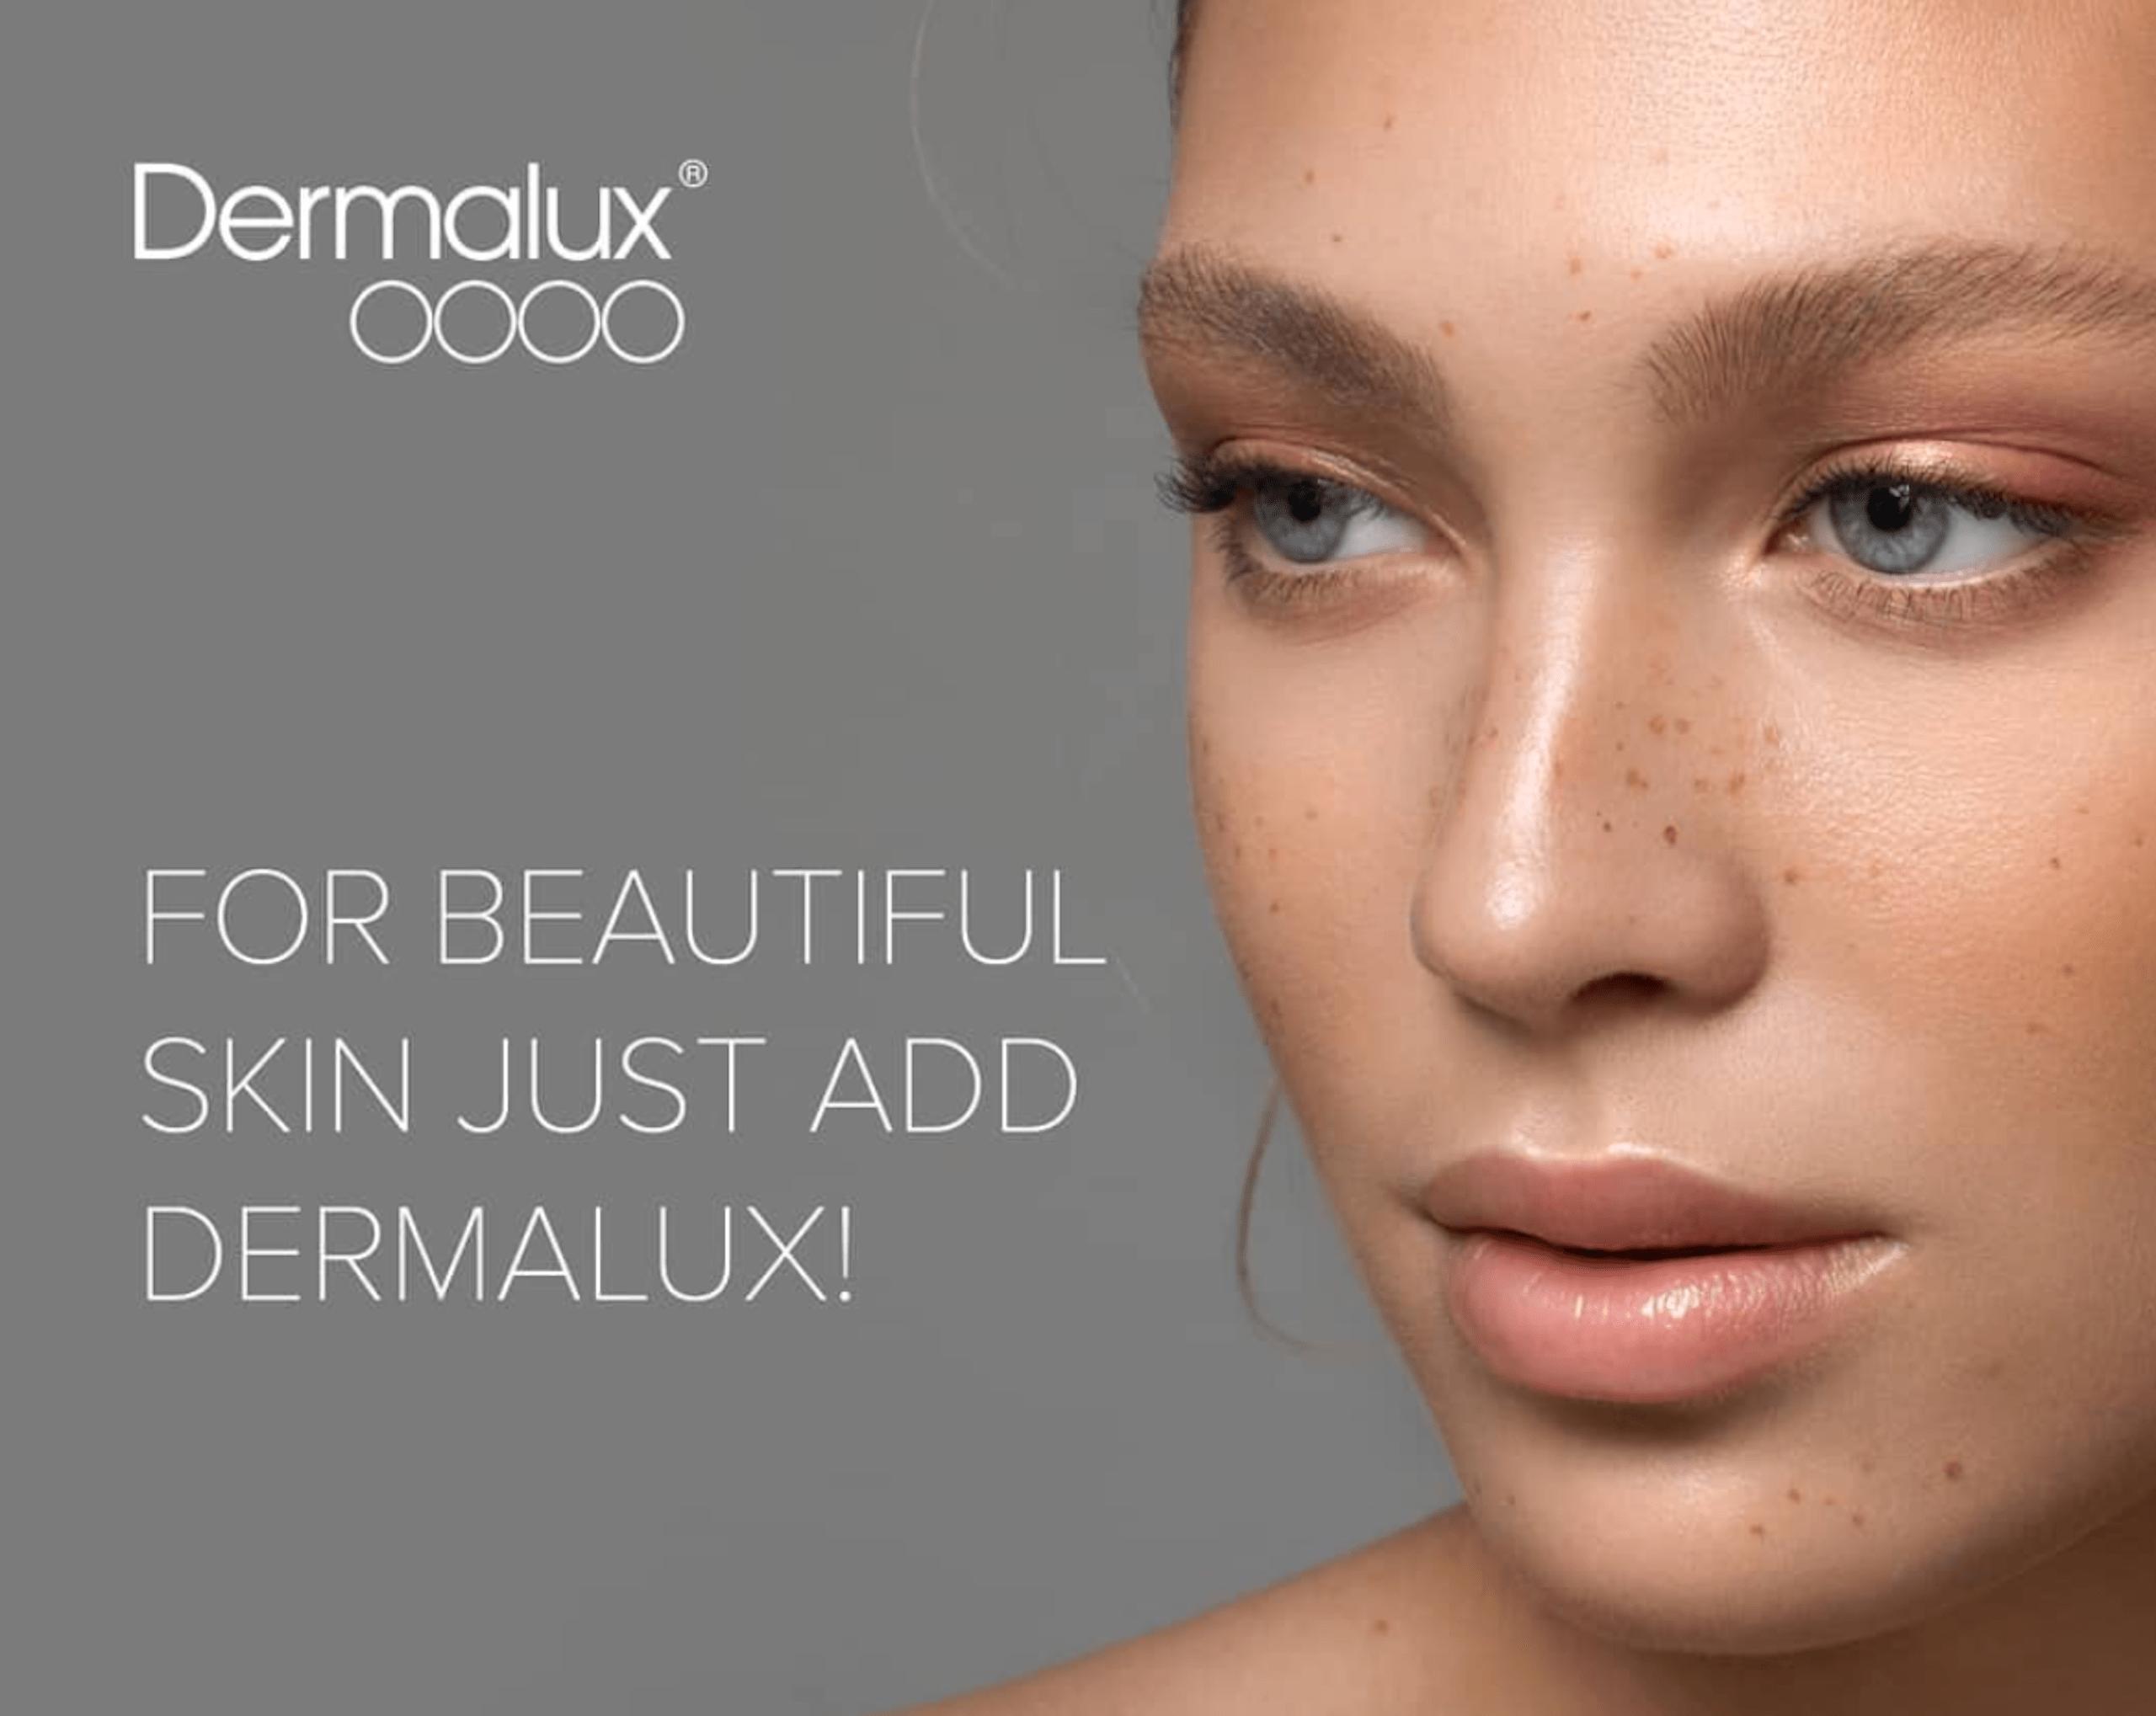 Dermalux LED Skin Treatment